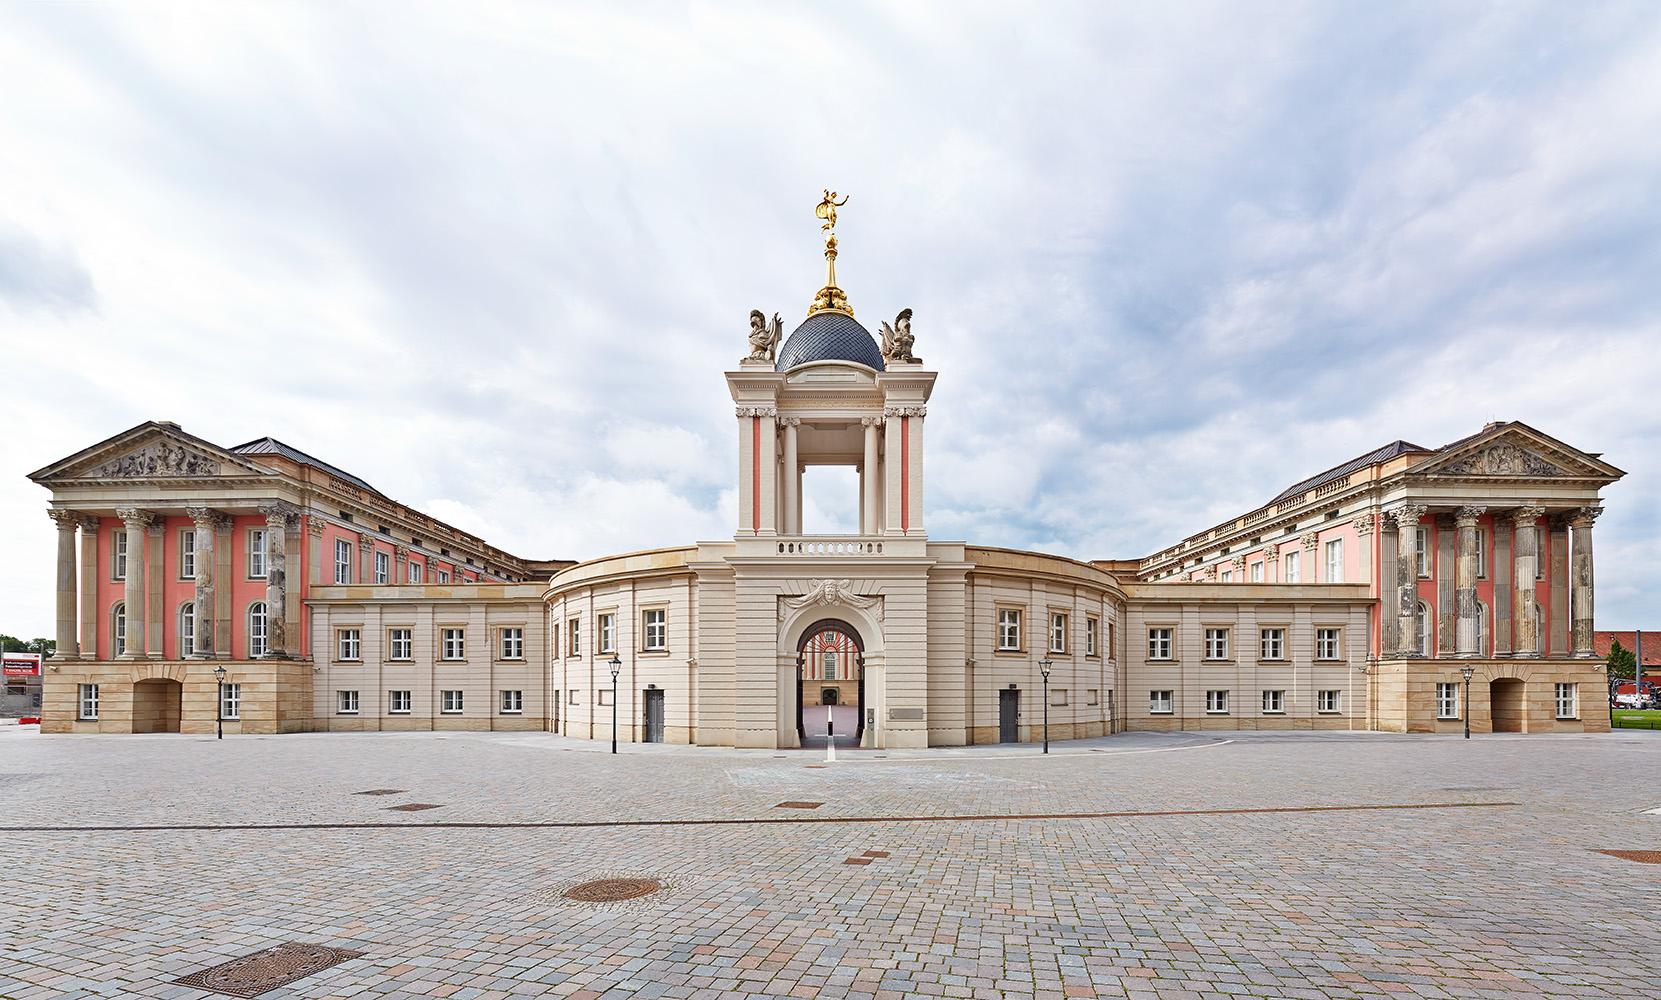 Brandenburg Parliament Potsdam